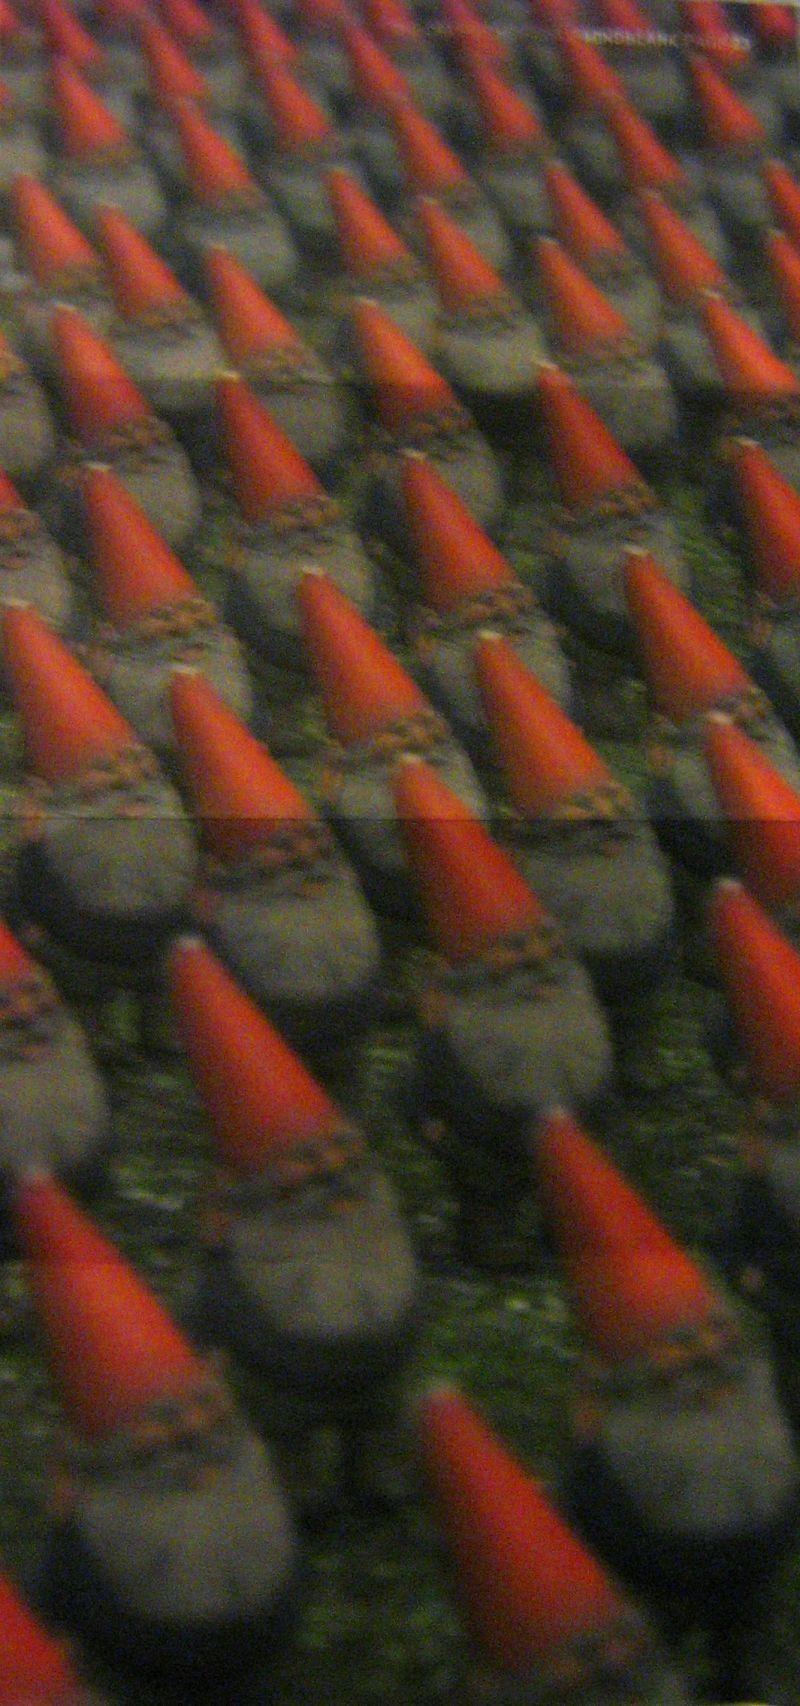 Day 198: Gnomes